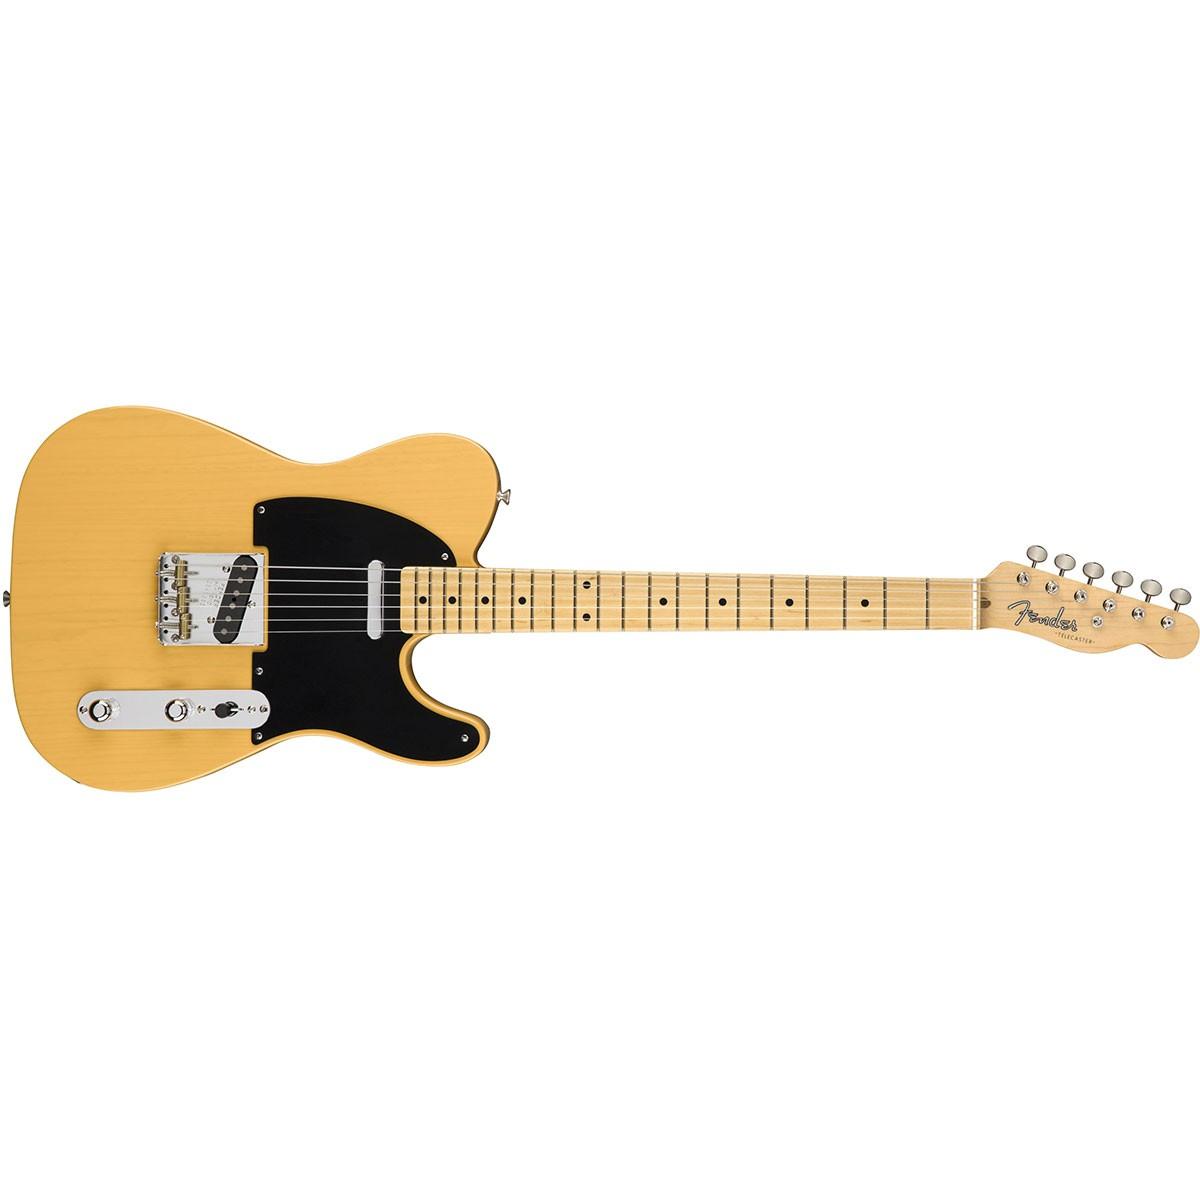 FENDER American Original 50 s Telecaster Butterscotch Blonde 0110132850 - Chitarre Chitarre - Elettriche